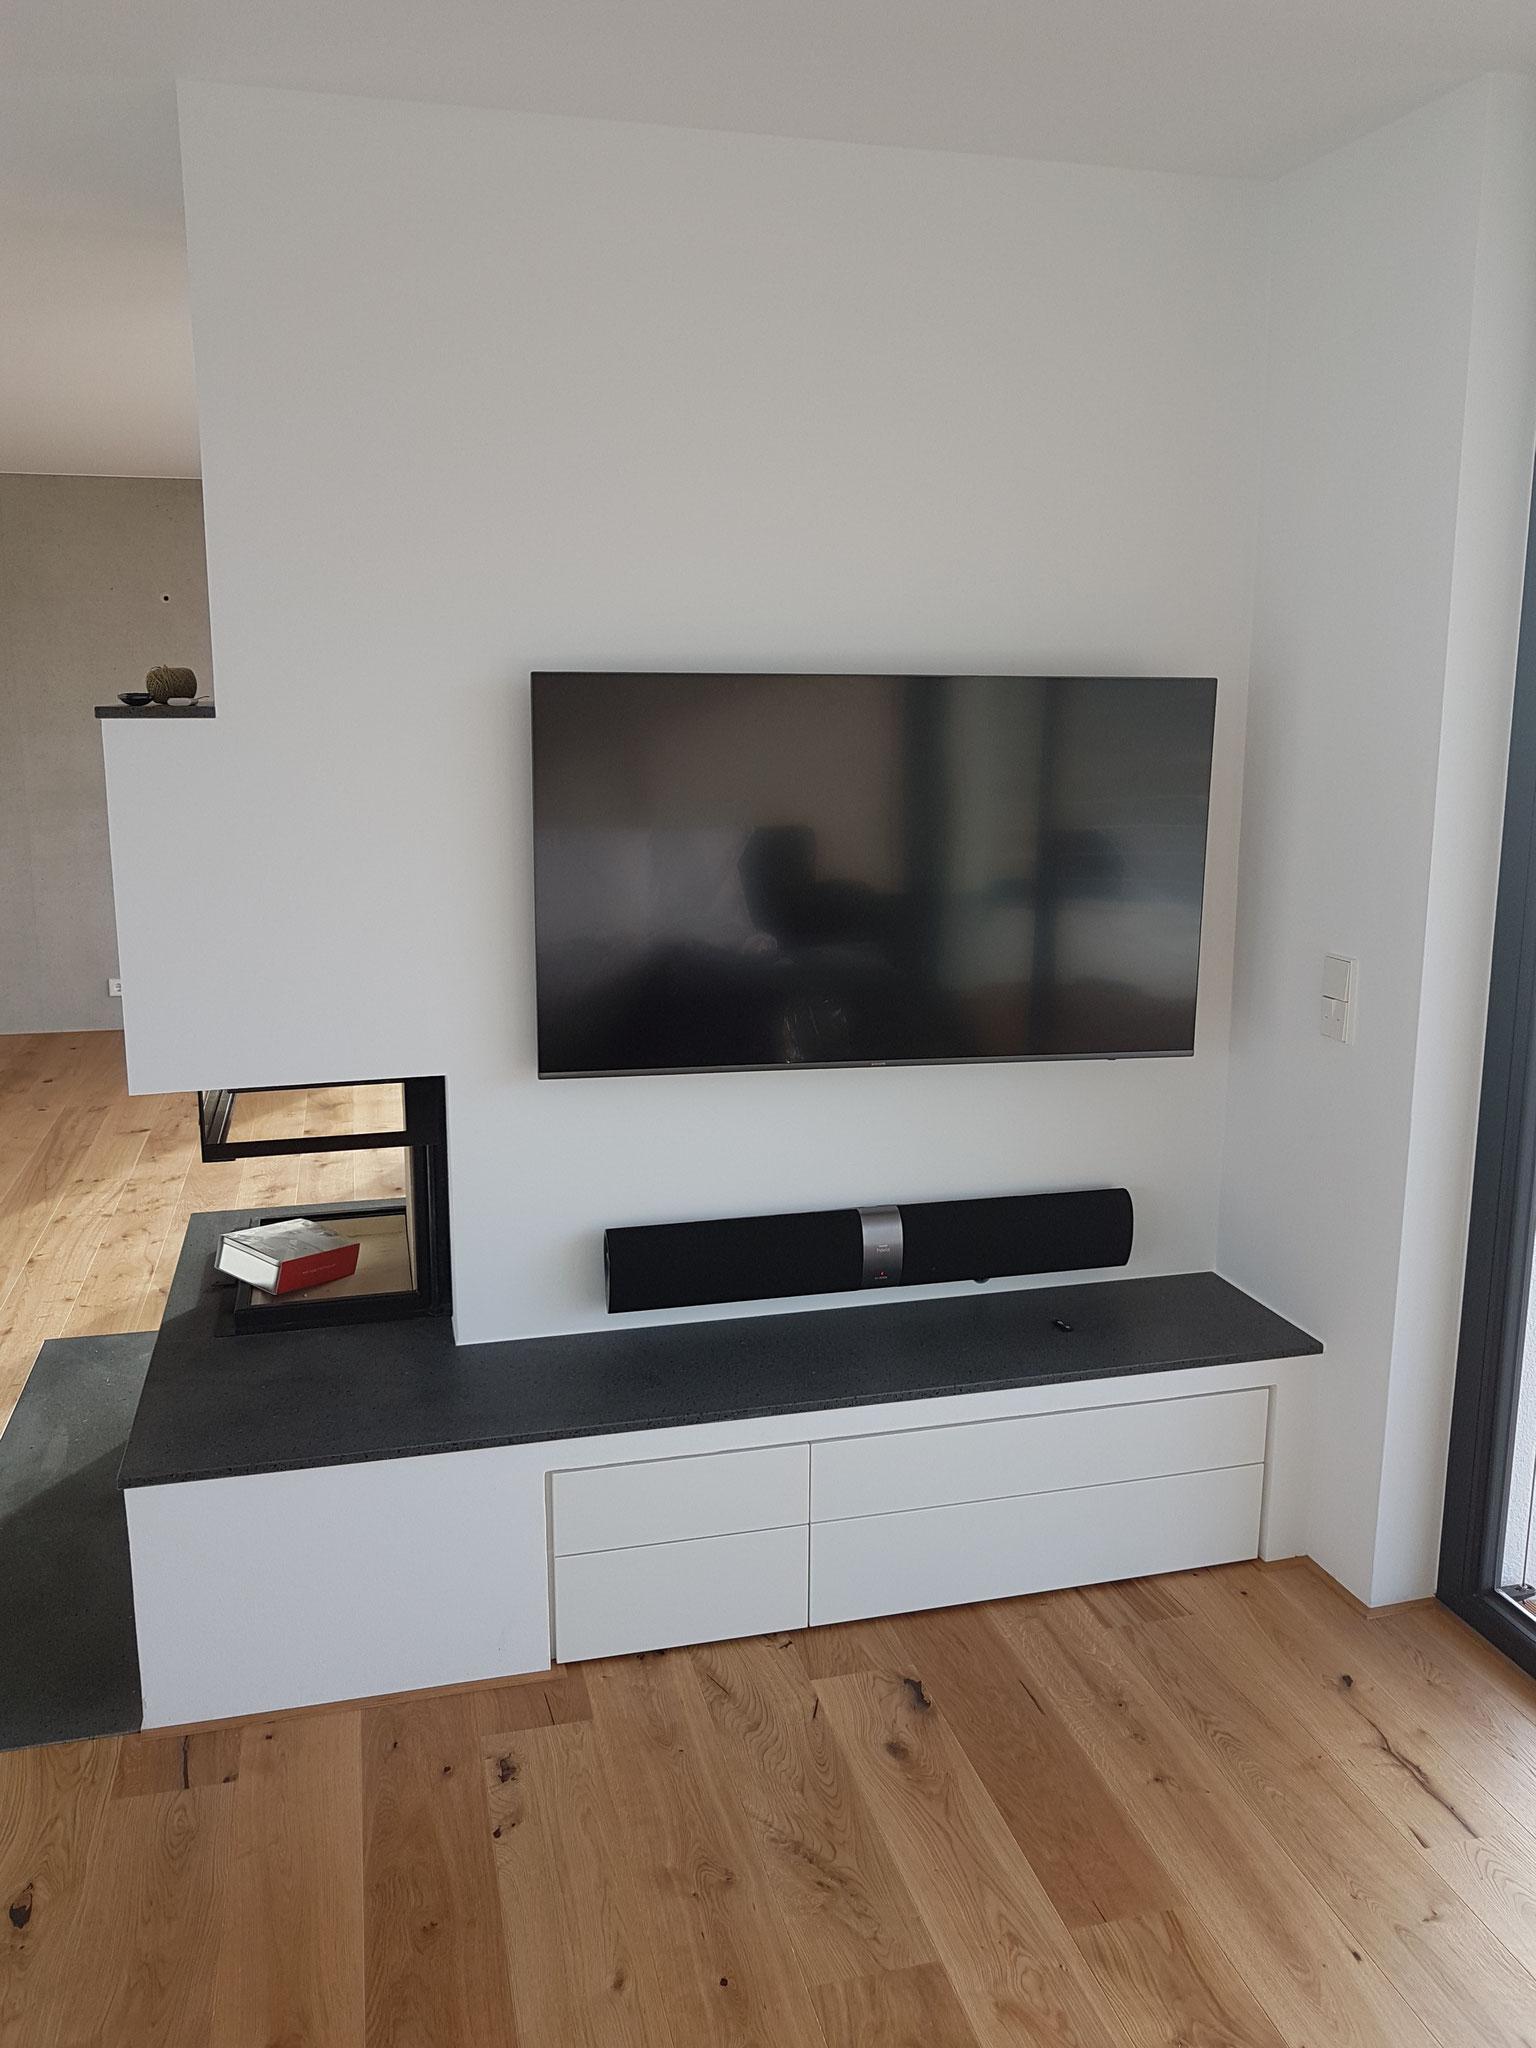 eingebauter TV-Schrank